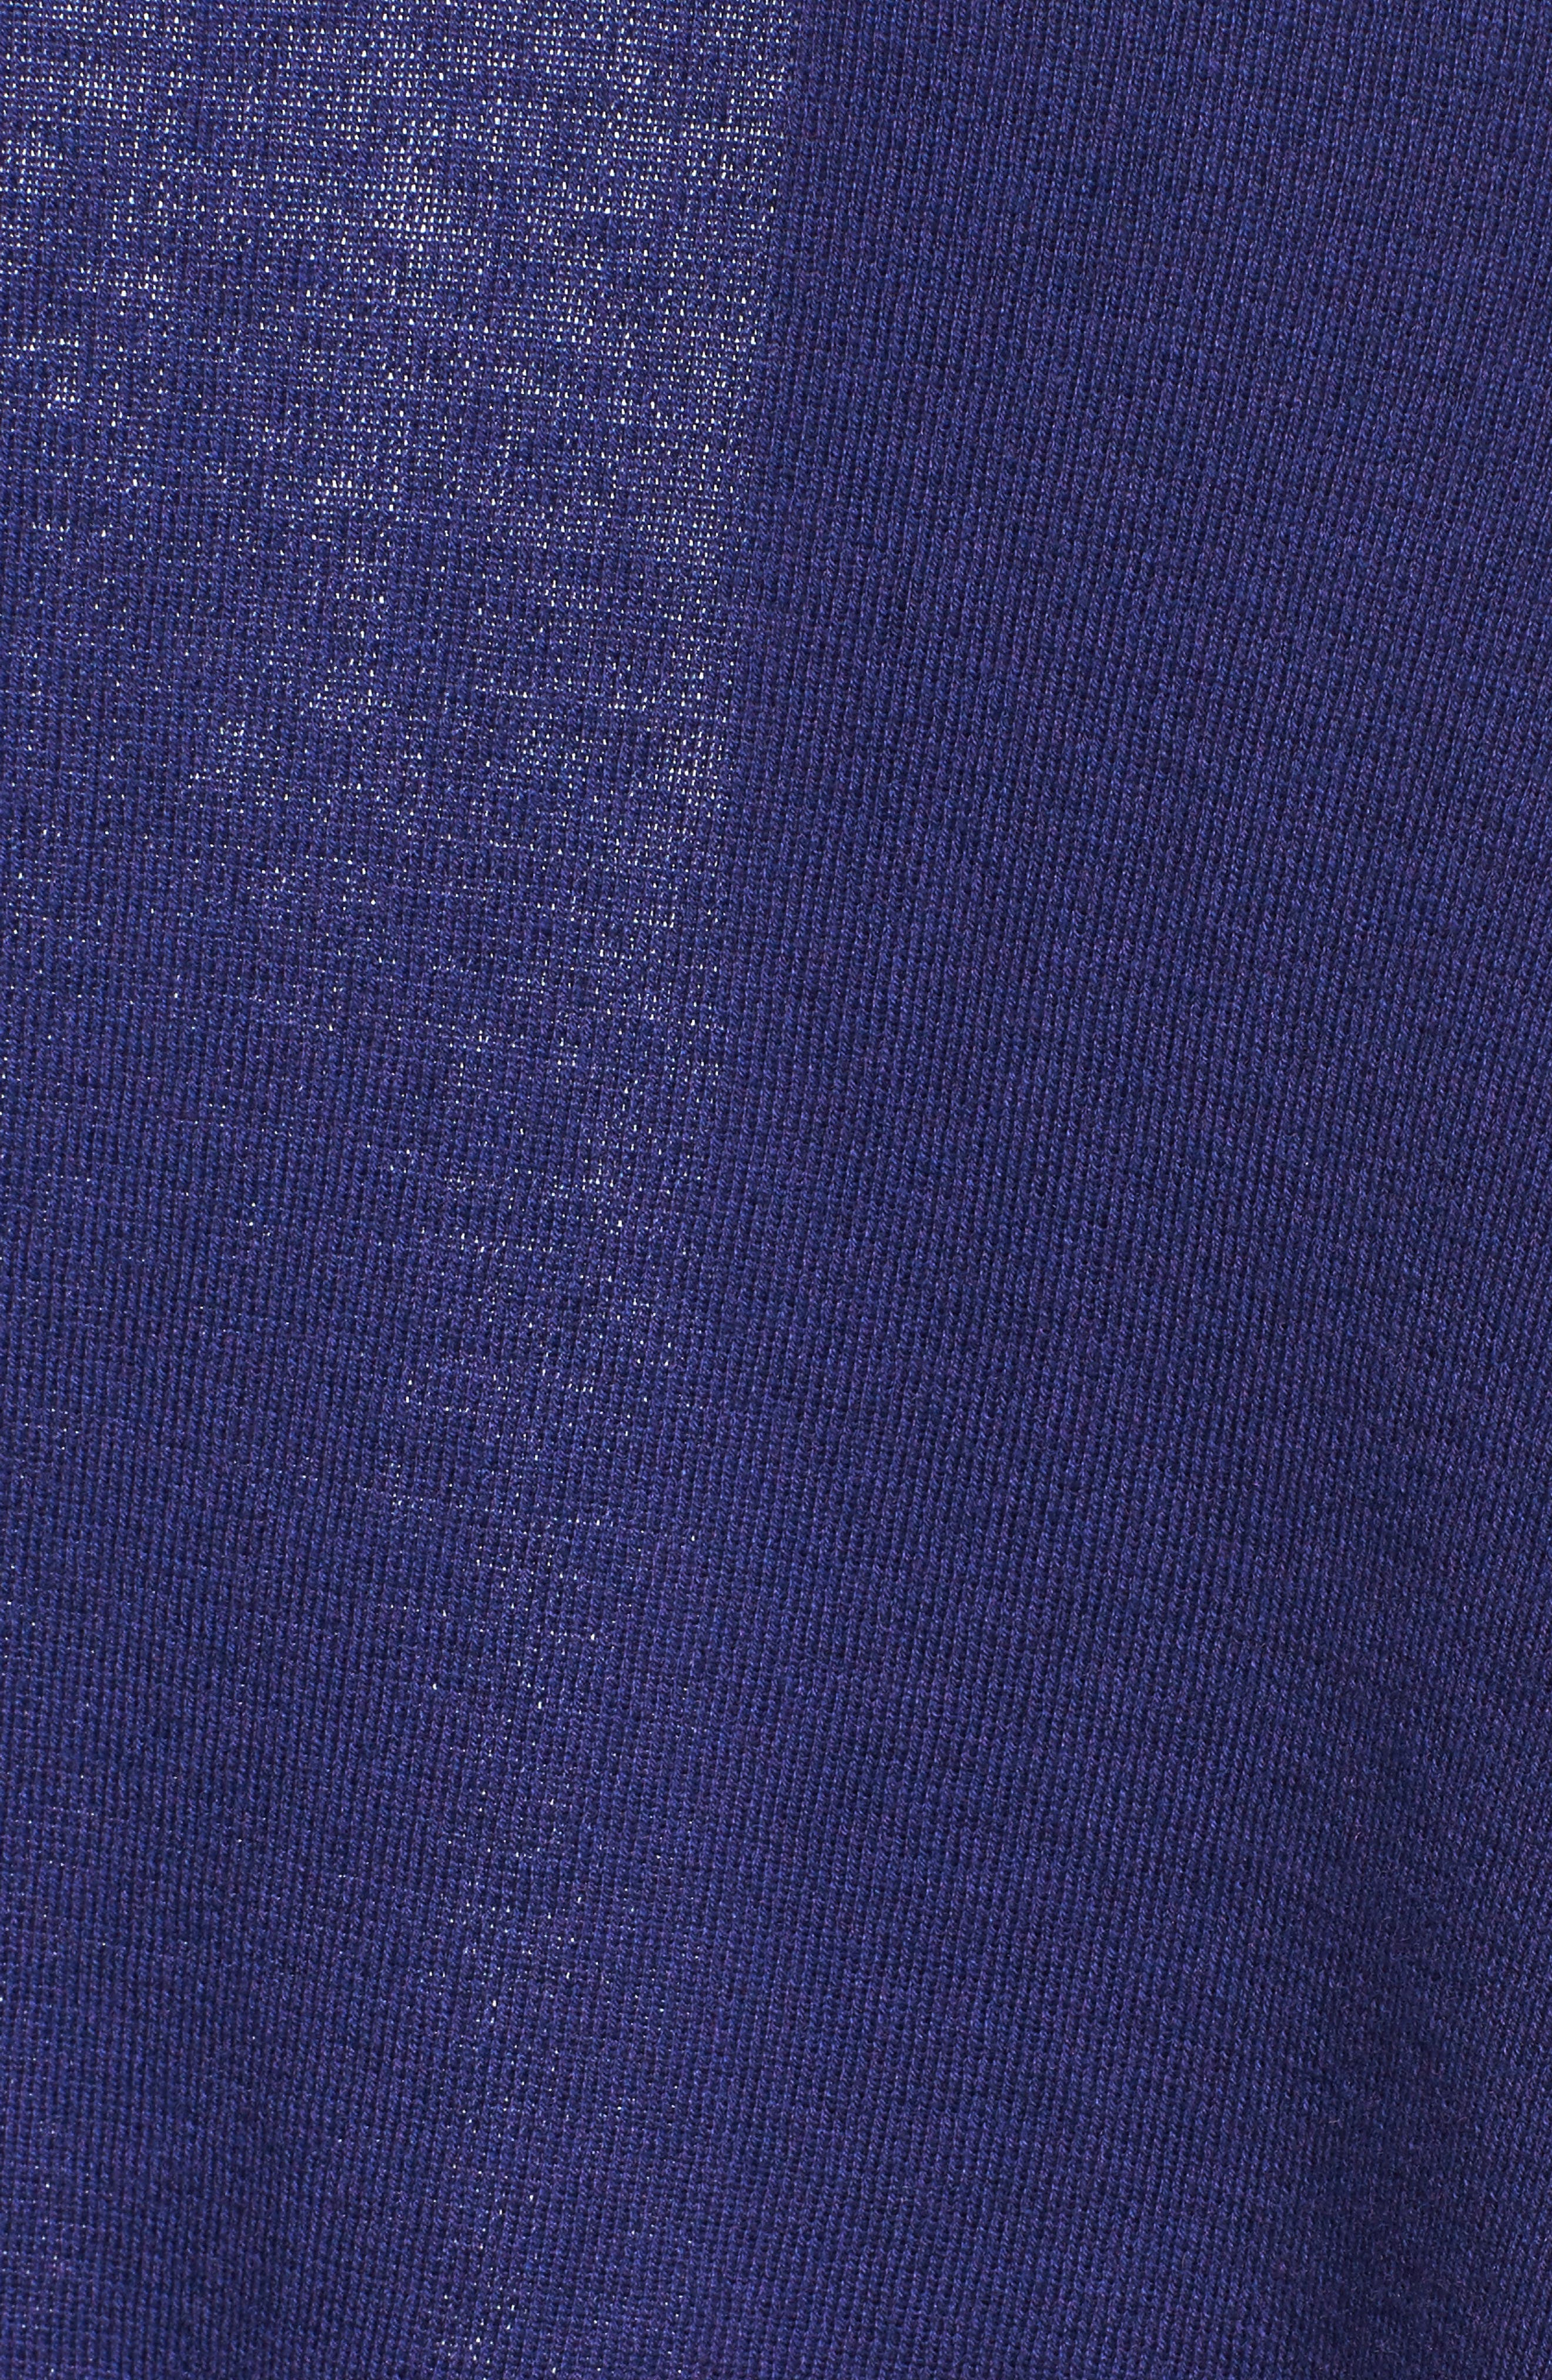 4-Way Convertible Cardigan,                             Alternate thumbnail 5, color,                             Electric Blue